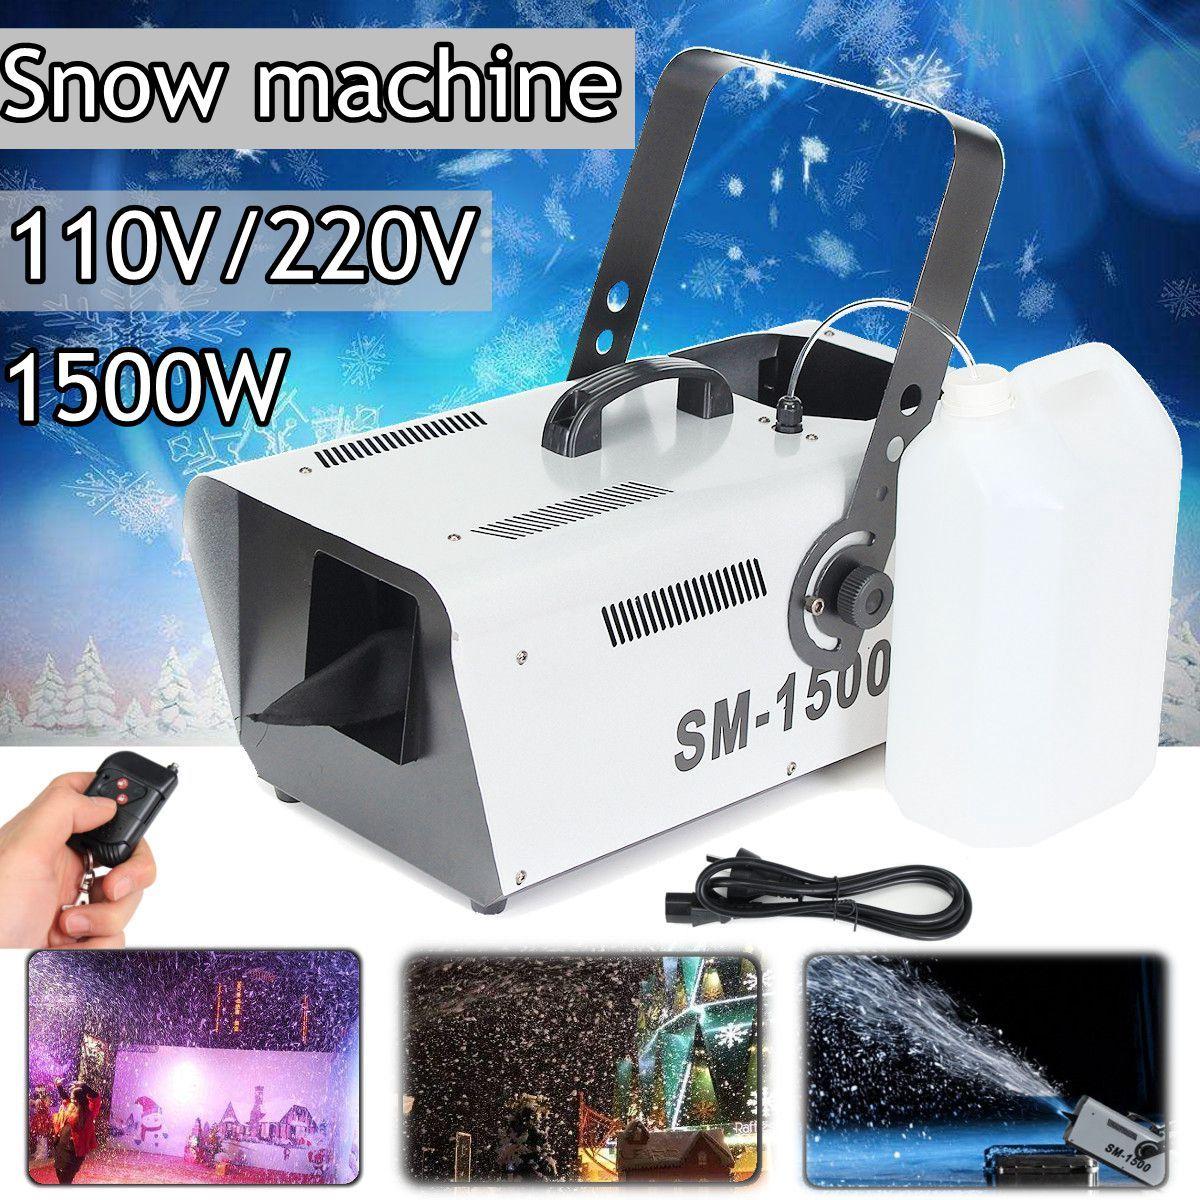 110V/220V 1500W Snow Machine Special Stage Effect Equipment Snowmaker Spray Snow Soap Foam Effect Machine DJ KTV